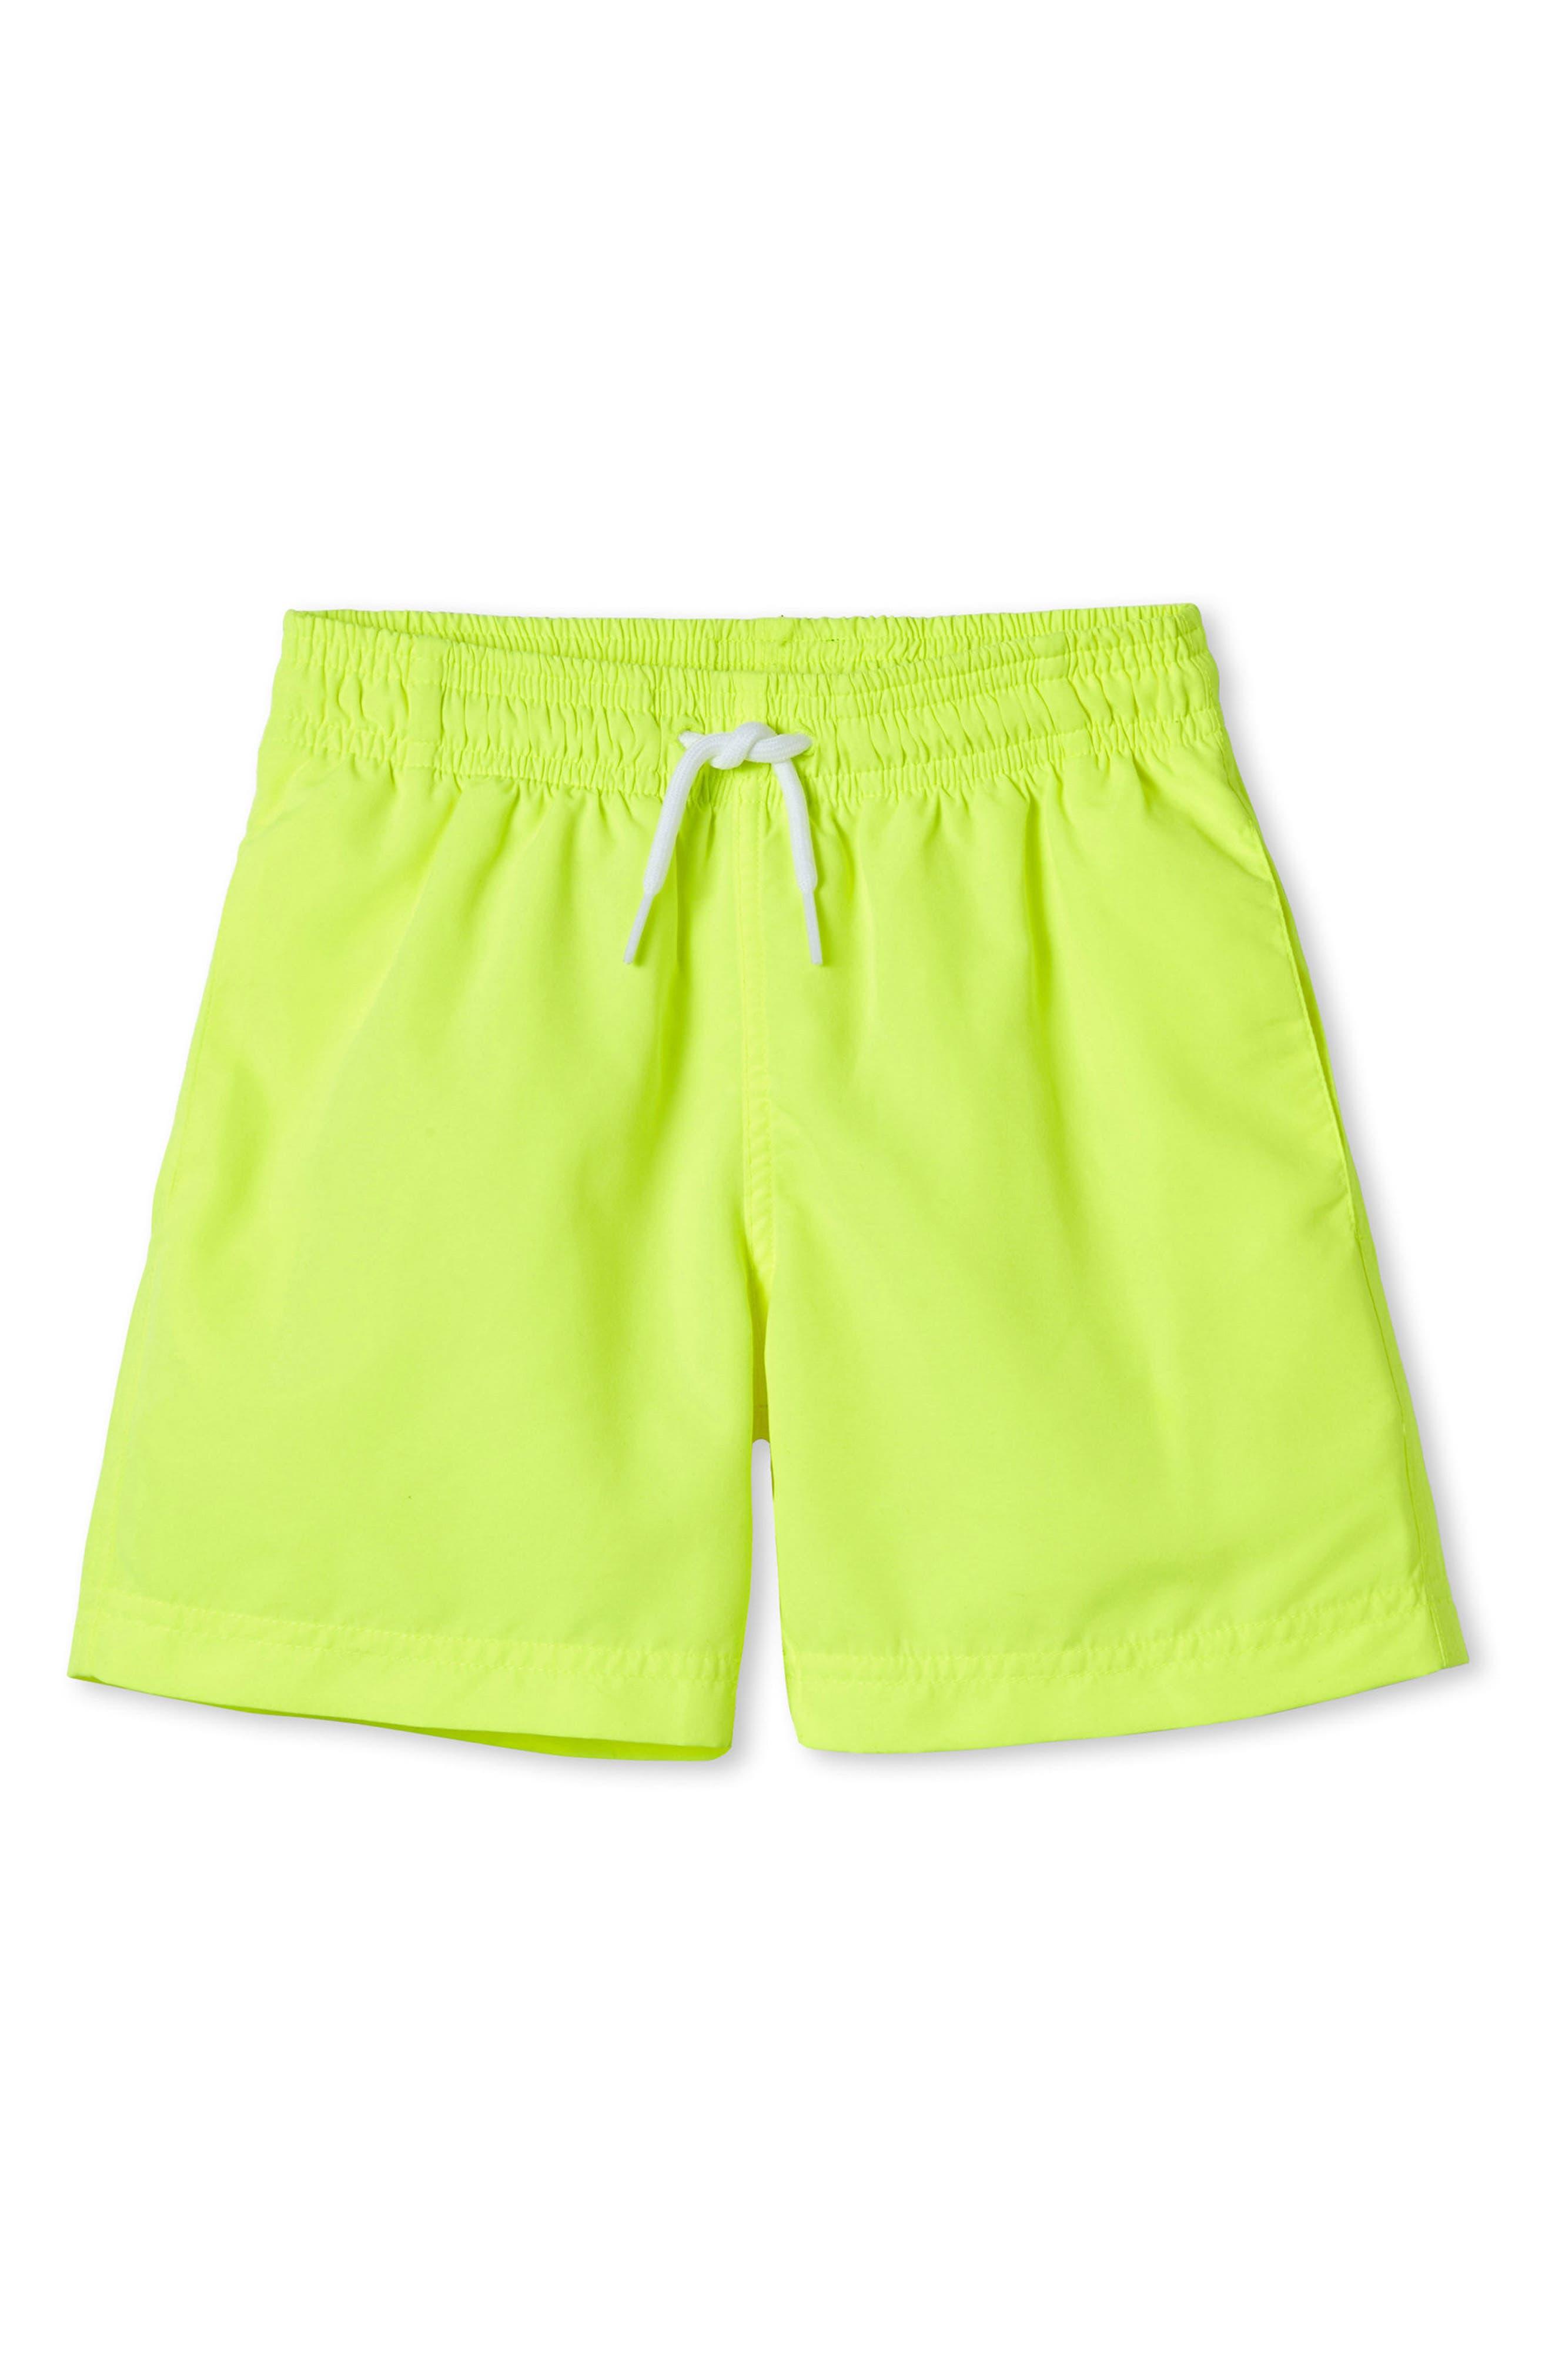 Neon Yellow Swim Trunks,                         Main,                         color, 750